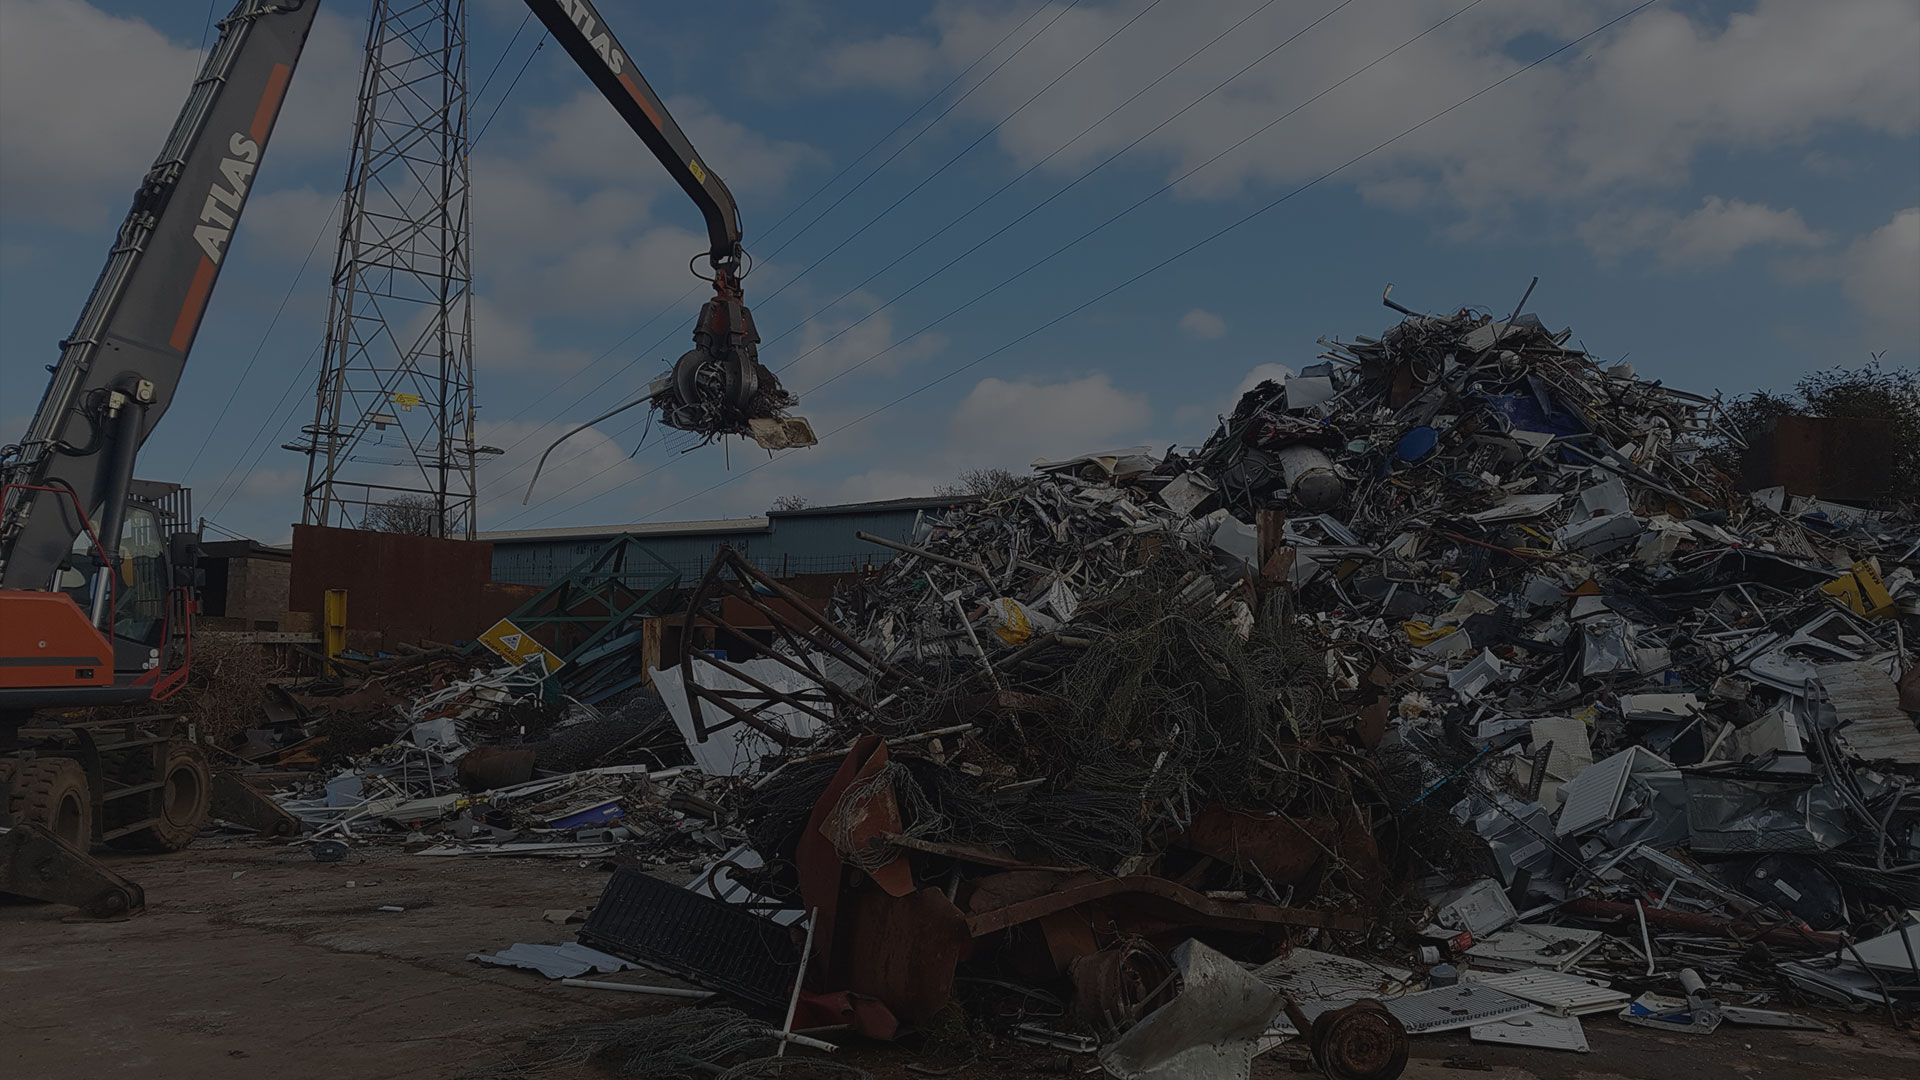 Metal Recycling in Dorset